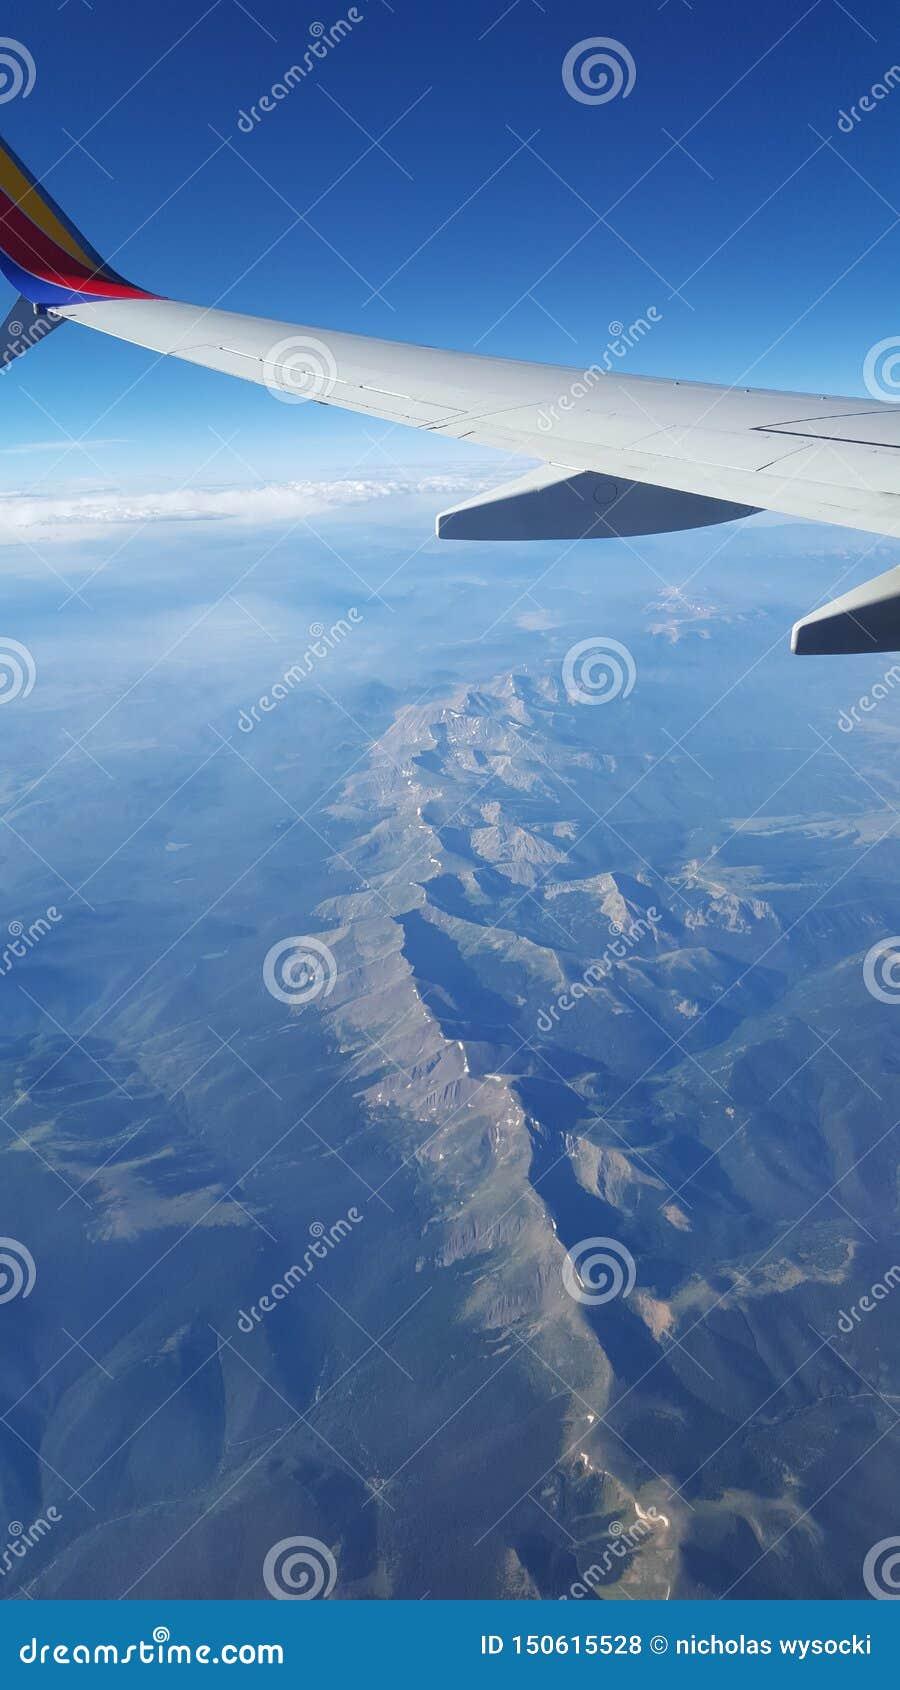 Samolotowe widok góry